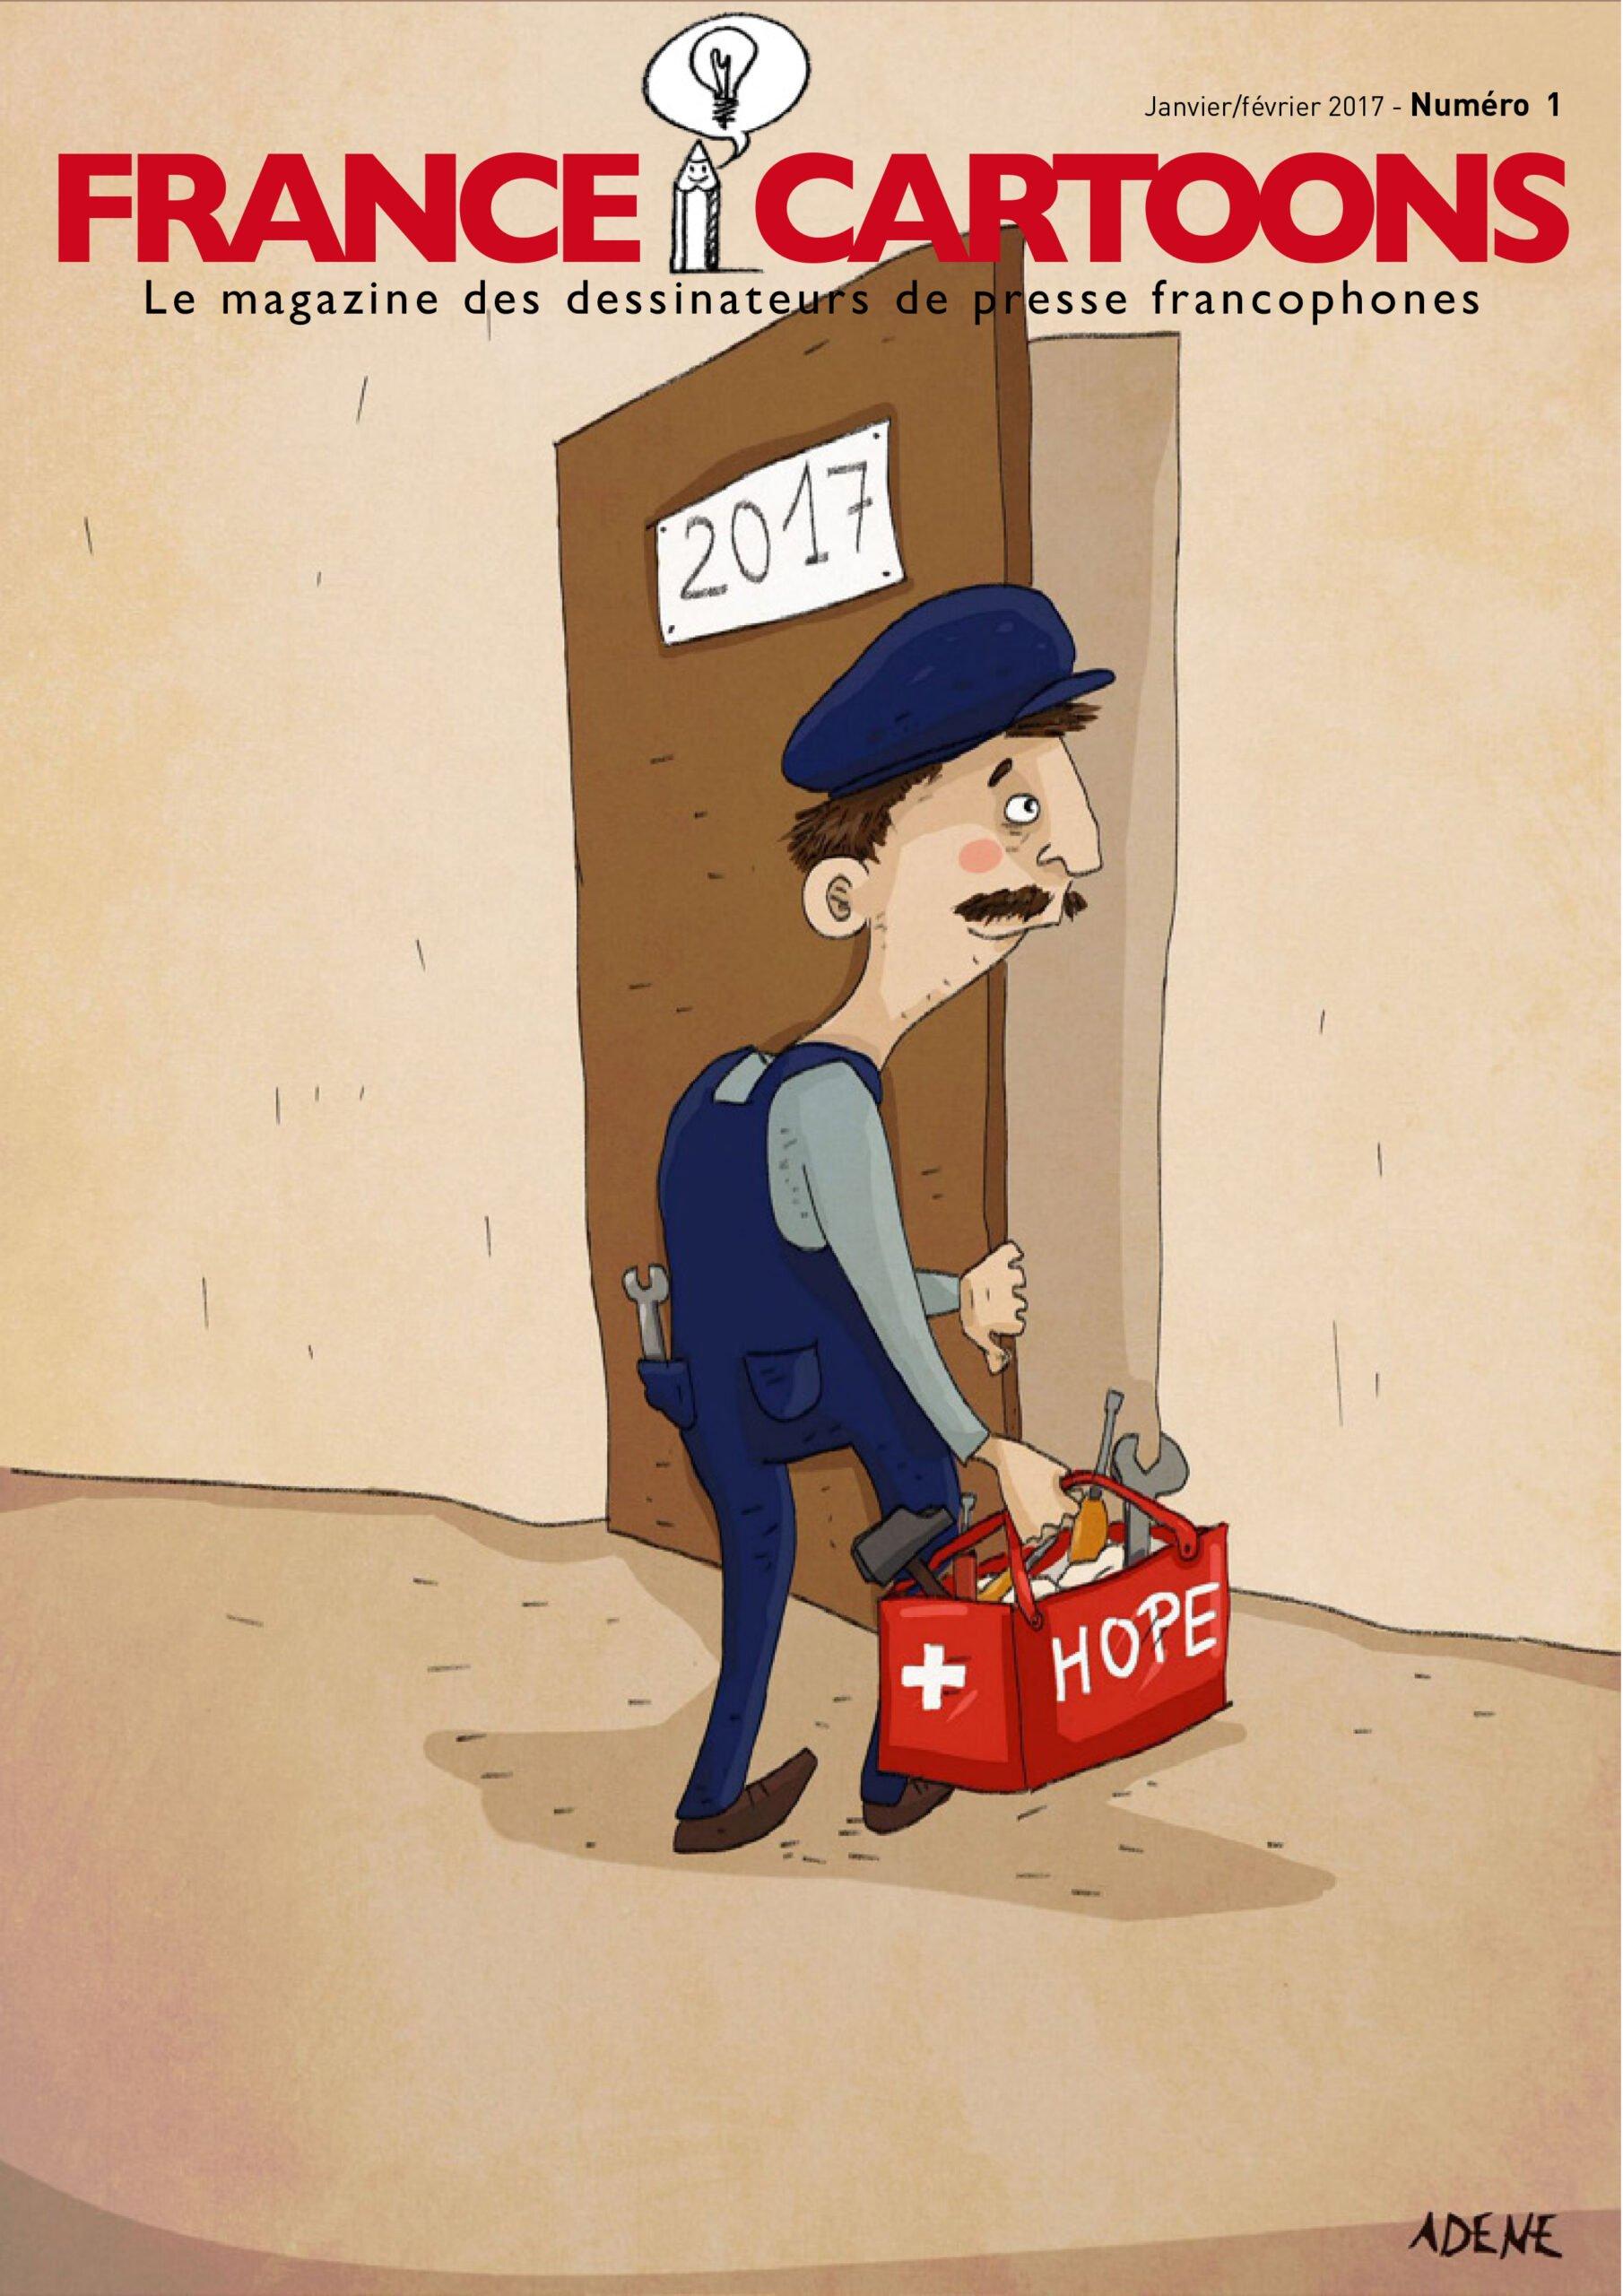 France-Cartoons n°1